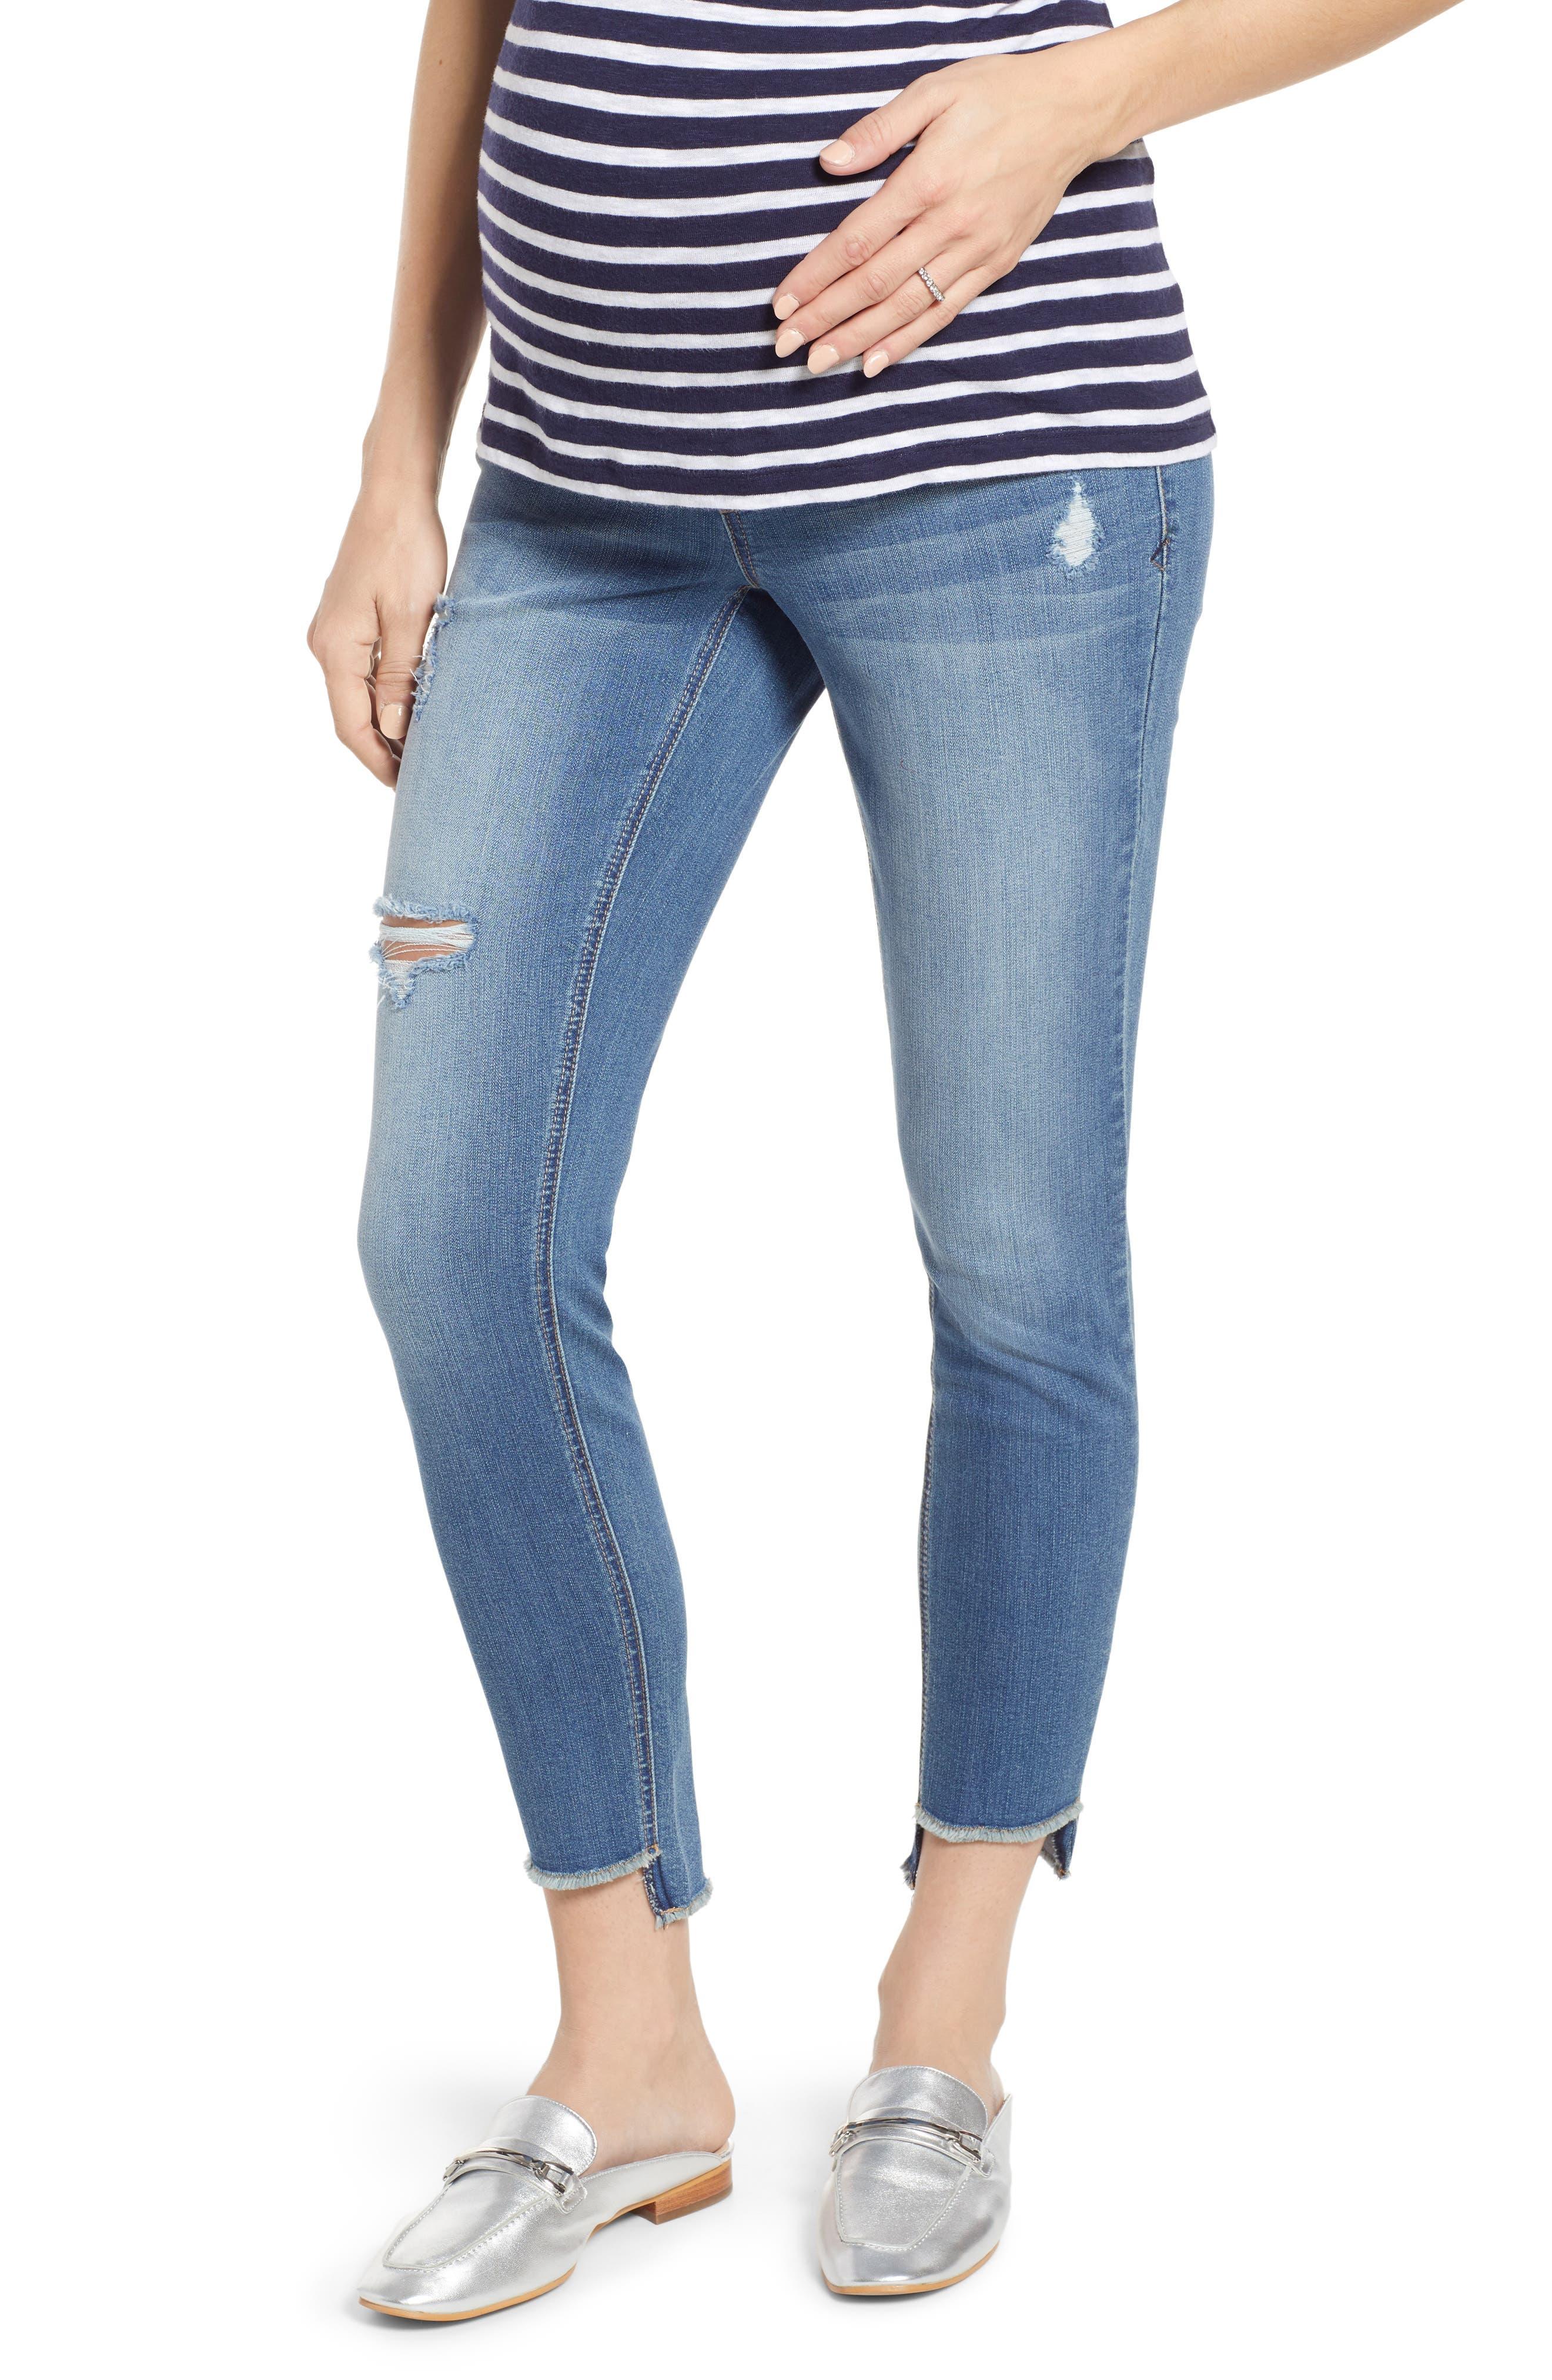 Women's 1822 Denim Step Hem Skinny Maternity Jeans